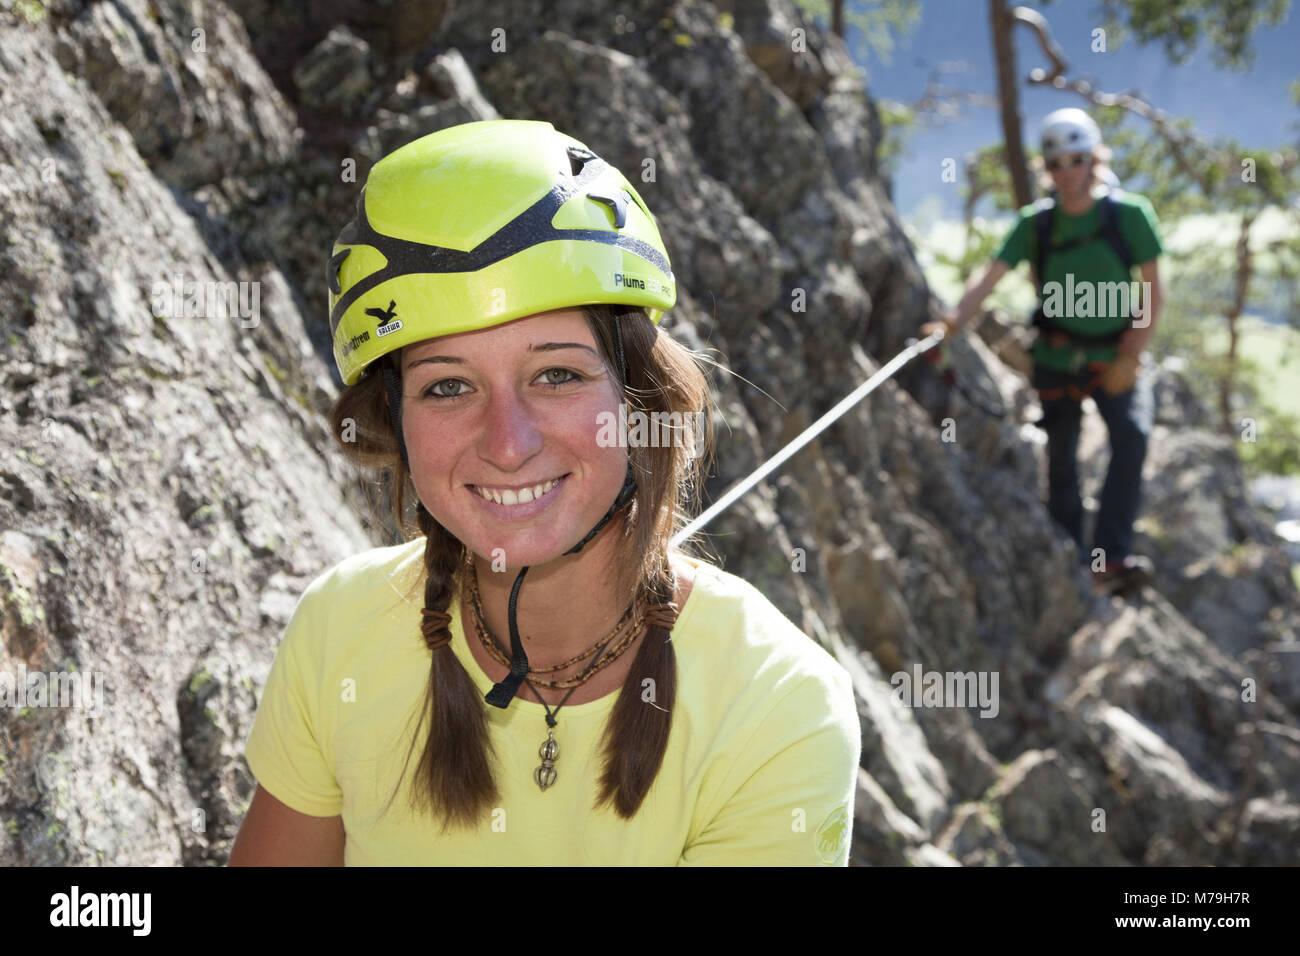 Klettersteig Lehner Wasserfall : Route klettersteig lehner wasserfall Ötztaler alpen tirol